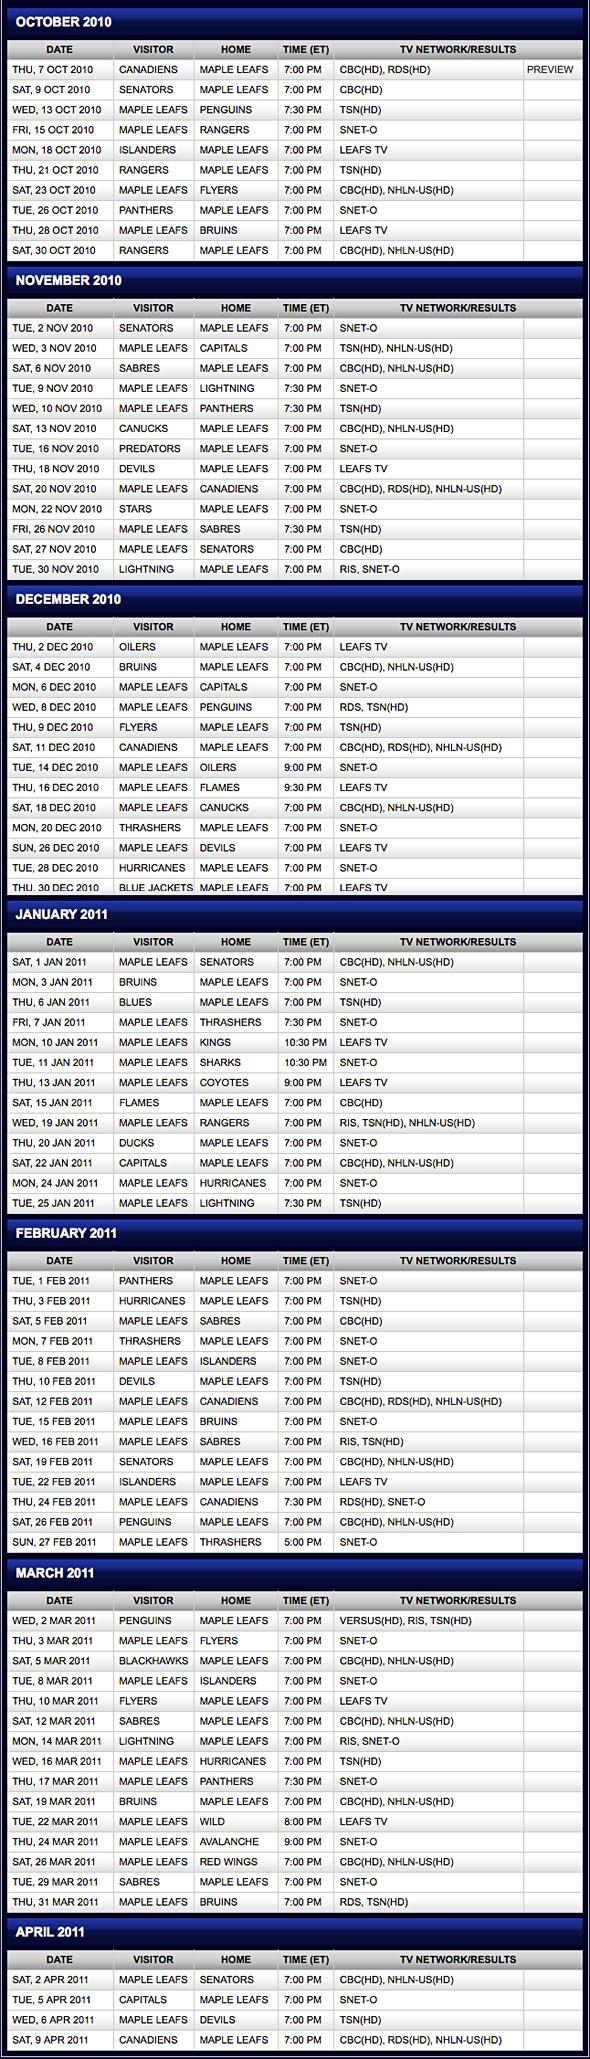 Toronto Maple Leafs Schedule 2010